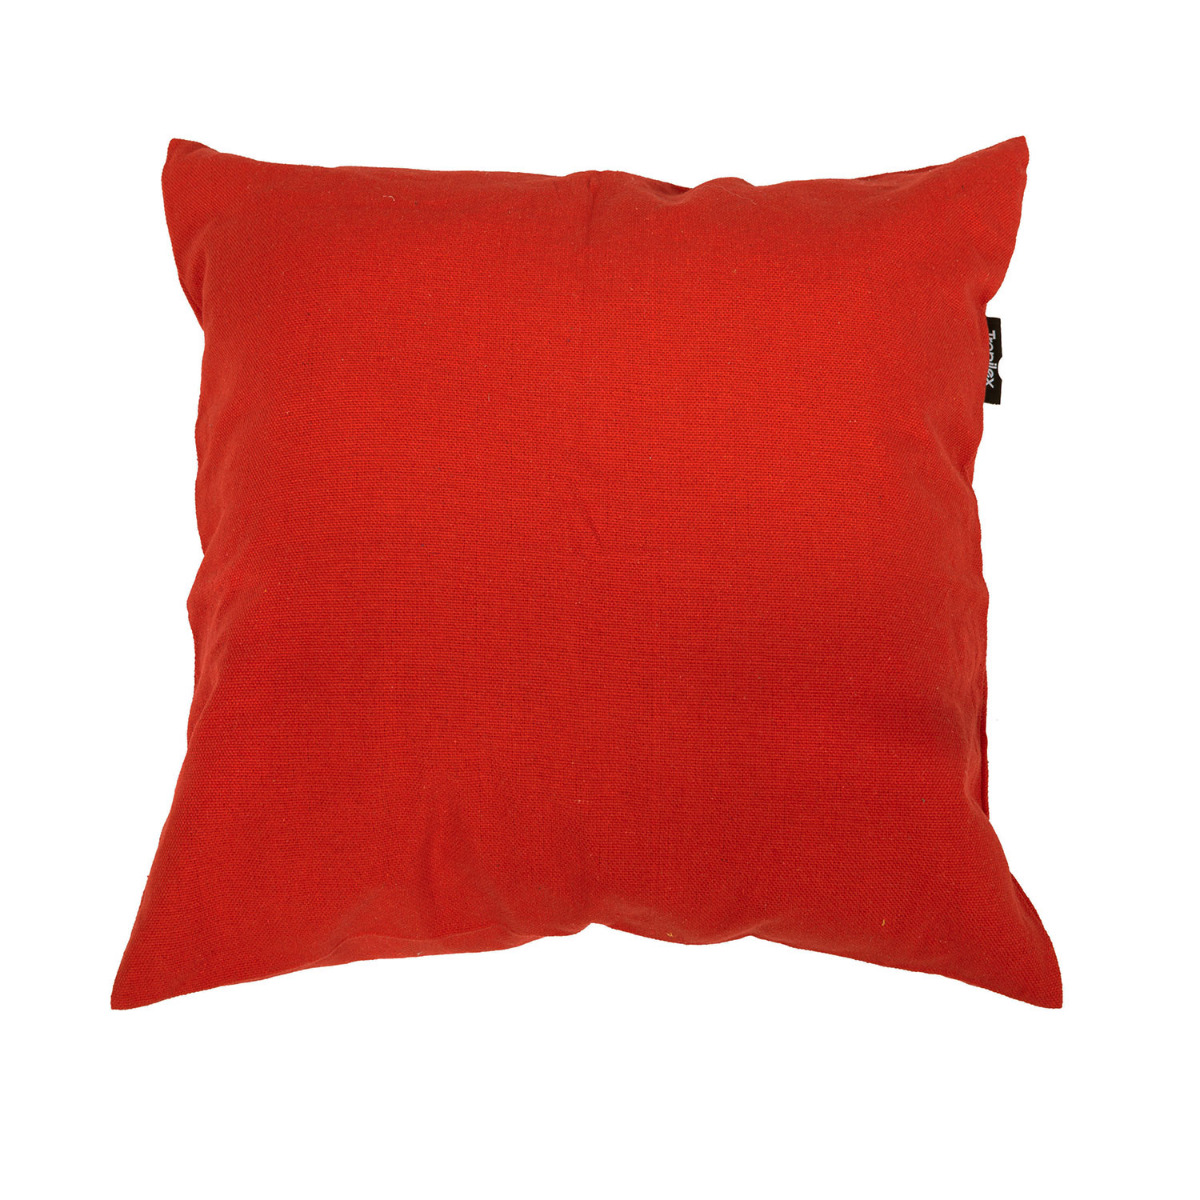 Kussen 'Plain' Red - Rood - Tropilex �